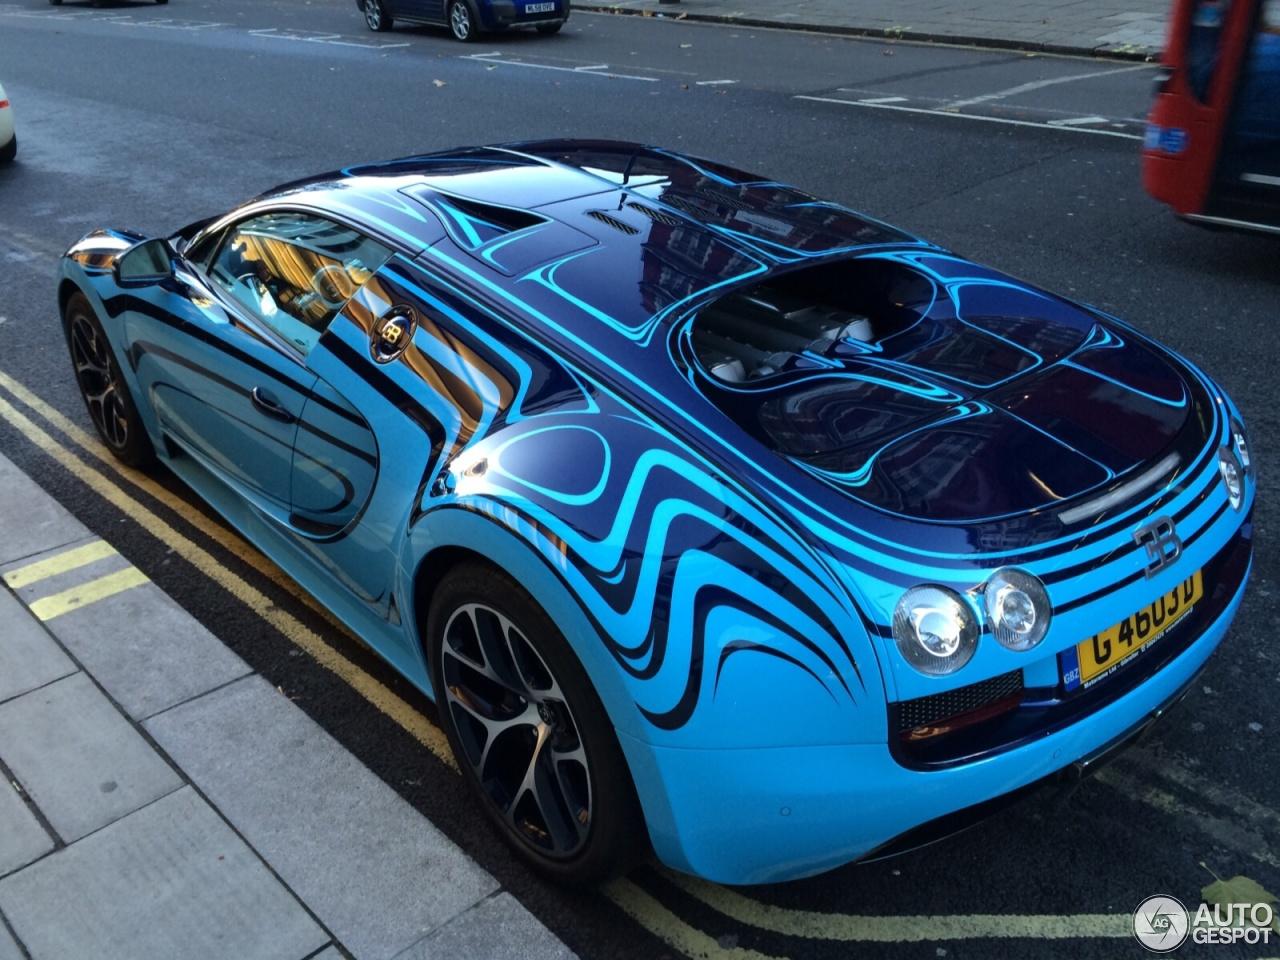 bugatti veyron 16.4 super sport le saphir bleu - 12 november 2014